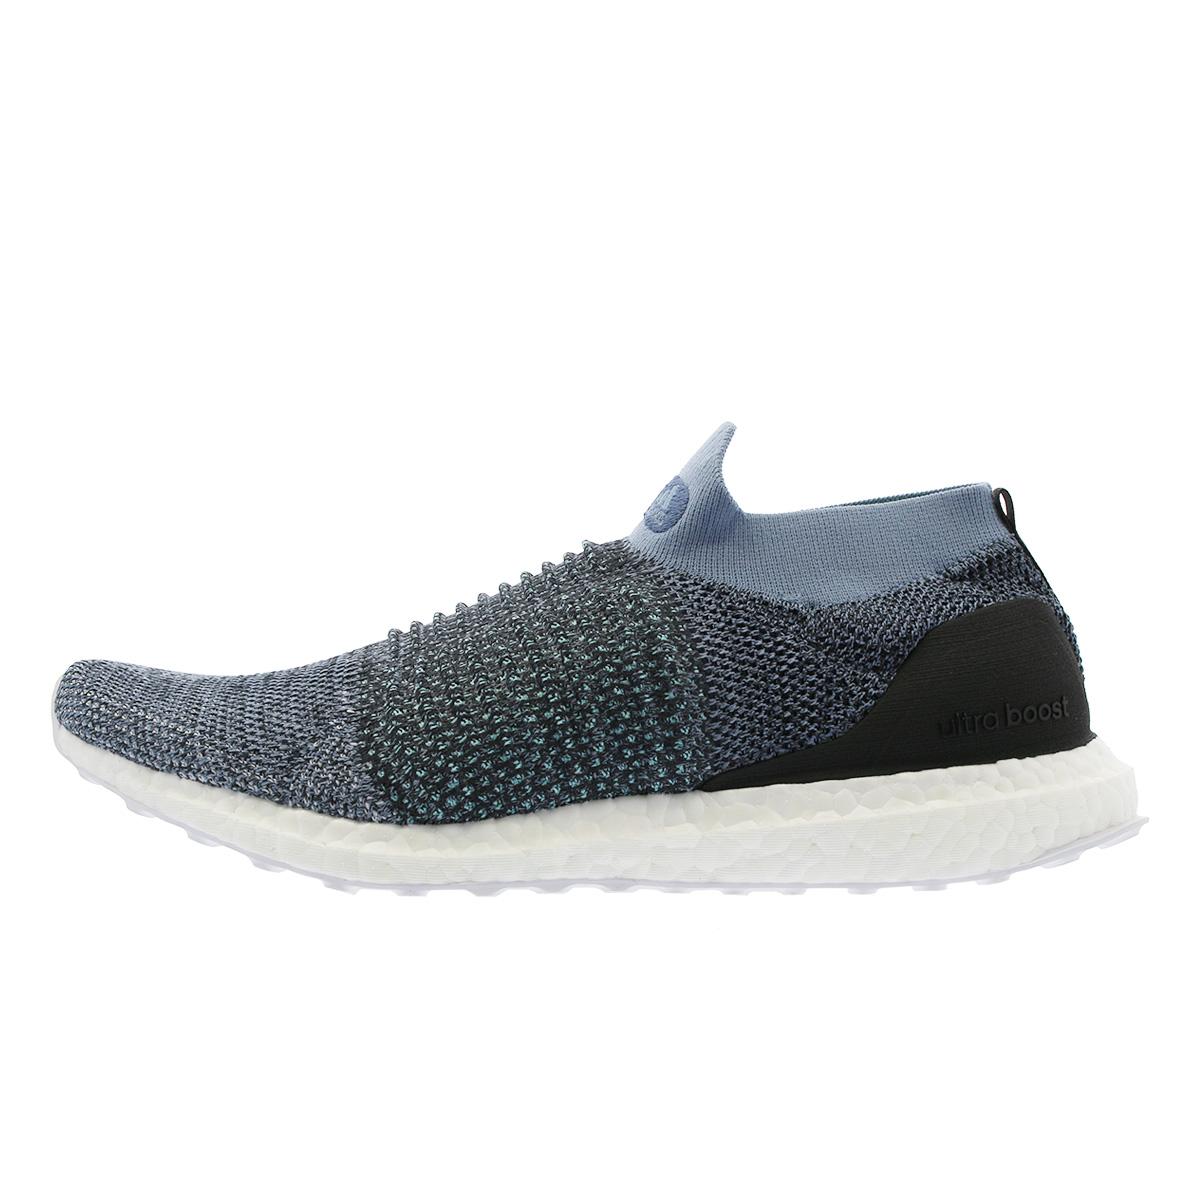 b53537871b06e adidas UltraBOOST LACELESS PARLEY Adidas ultra boost raceless gone lei GREY CARBON BLUE  SPLIT cm8271